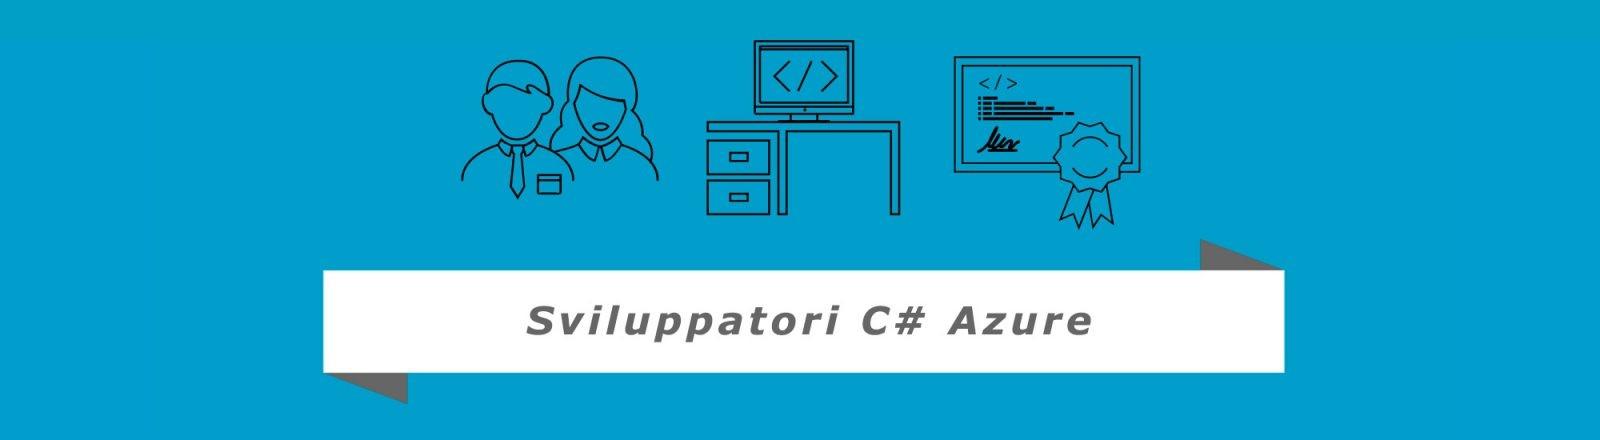 Recruiting Sviluppatori C Azure